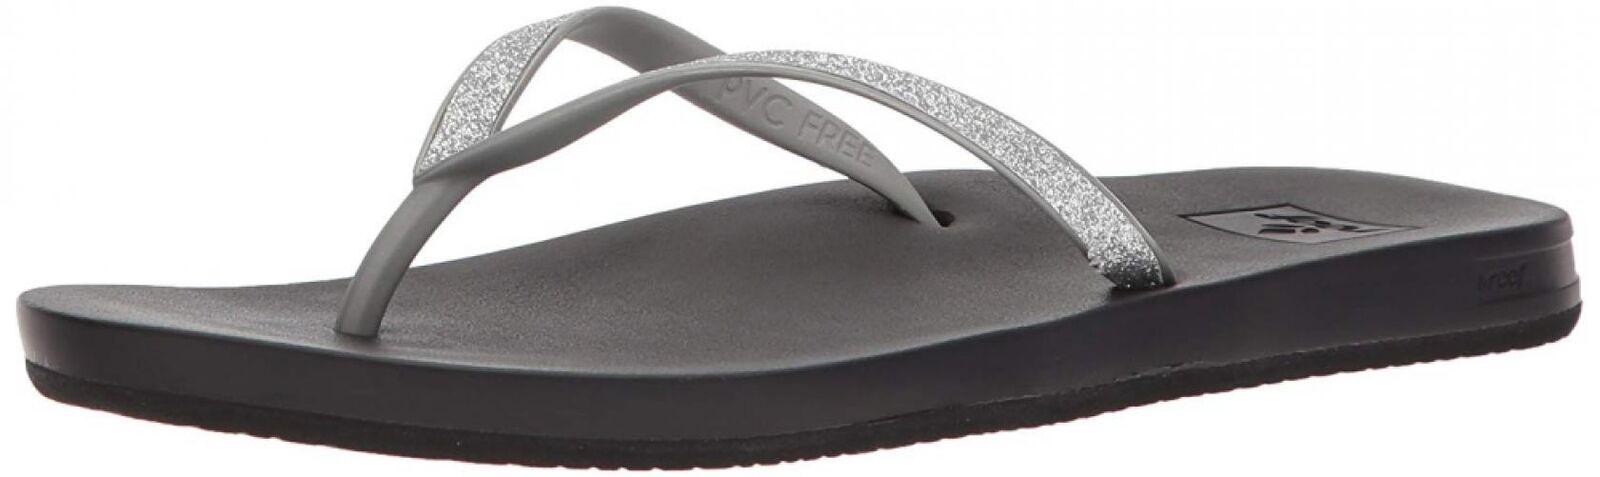 Reef femmes Sandals Stargazer   Glitter Flip Flops for femmes With Cushion...